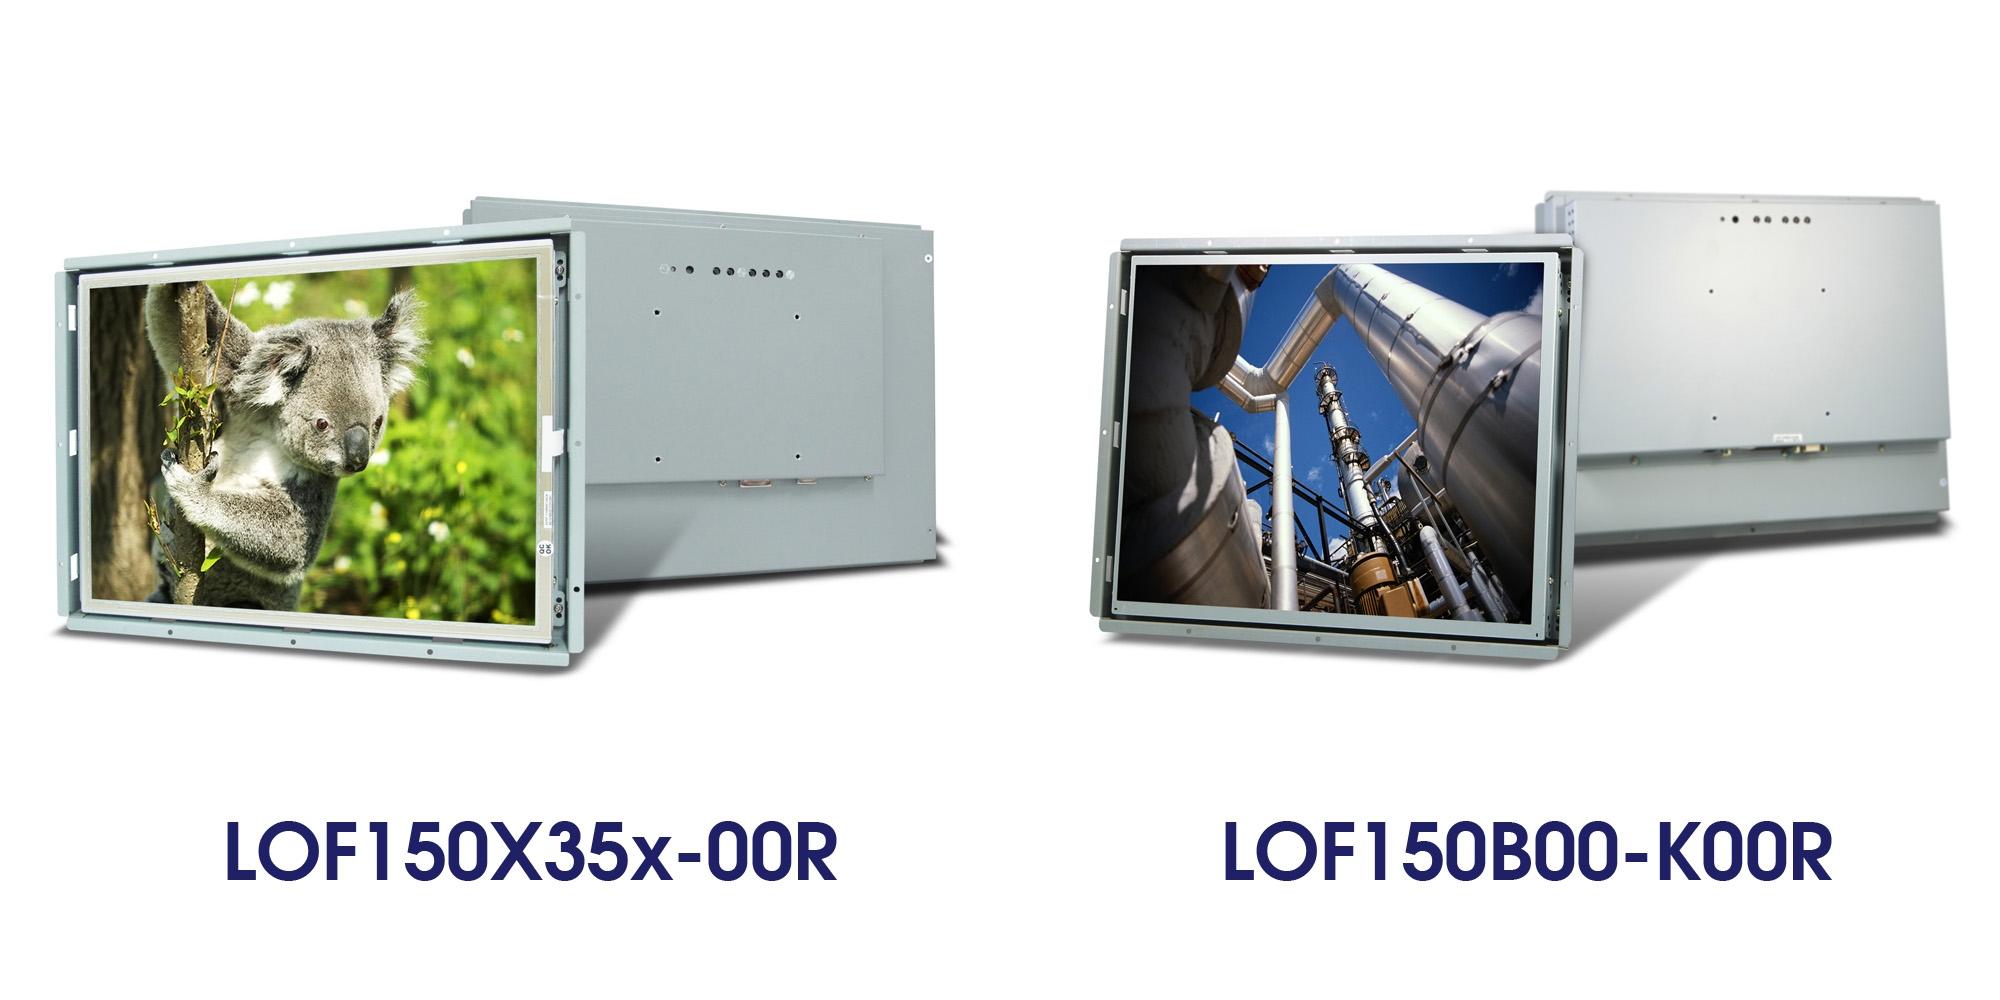 LOF150X35x-00R LOF150B00-K00R